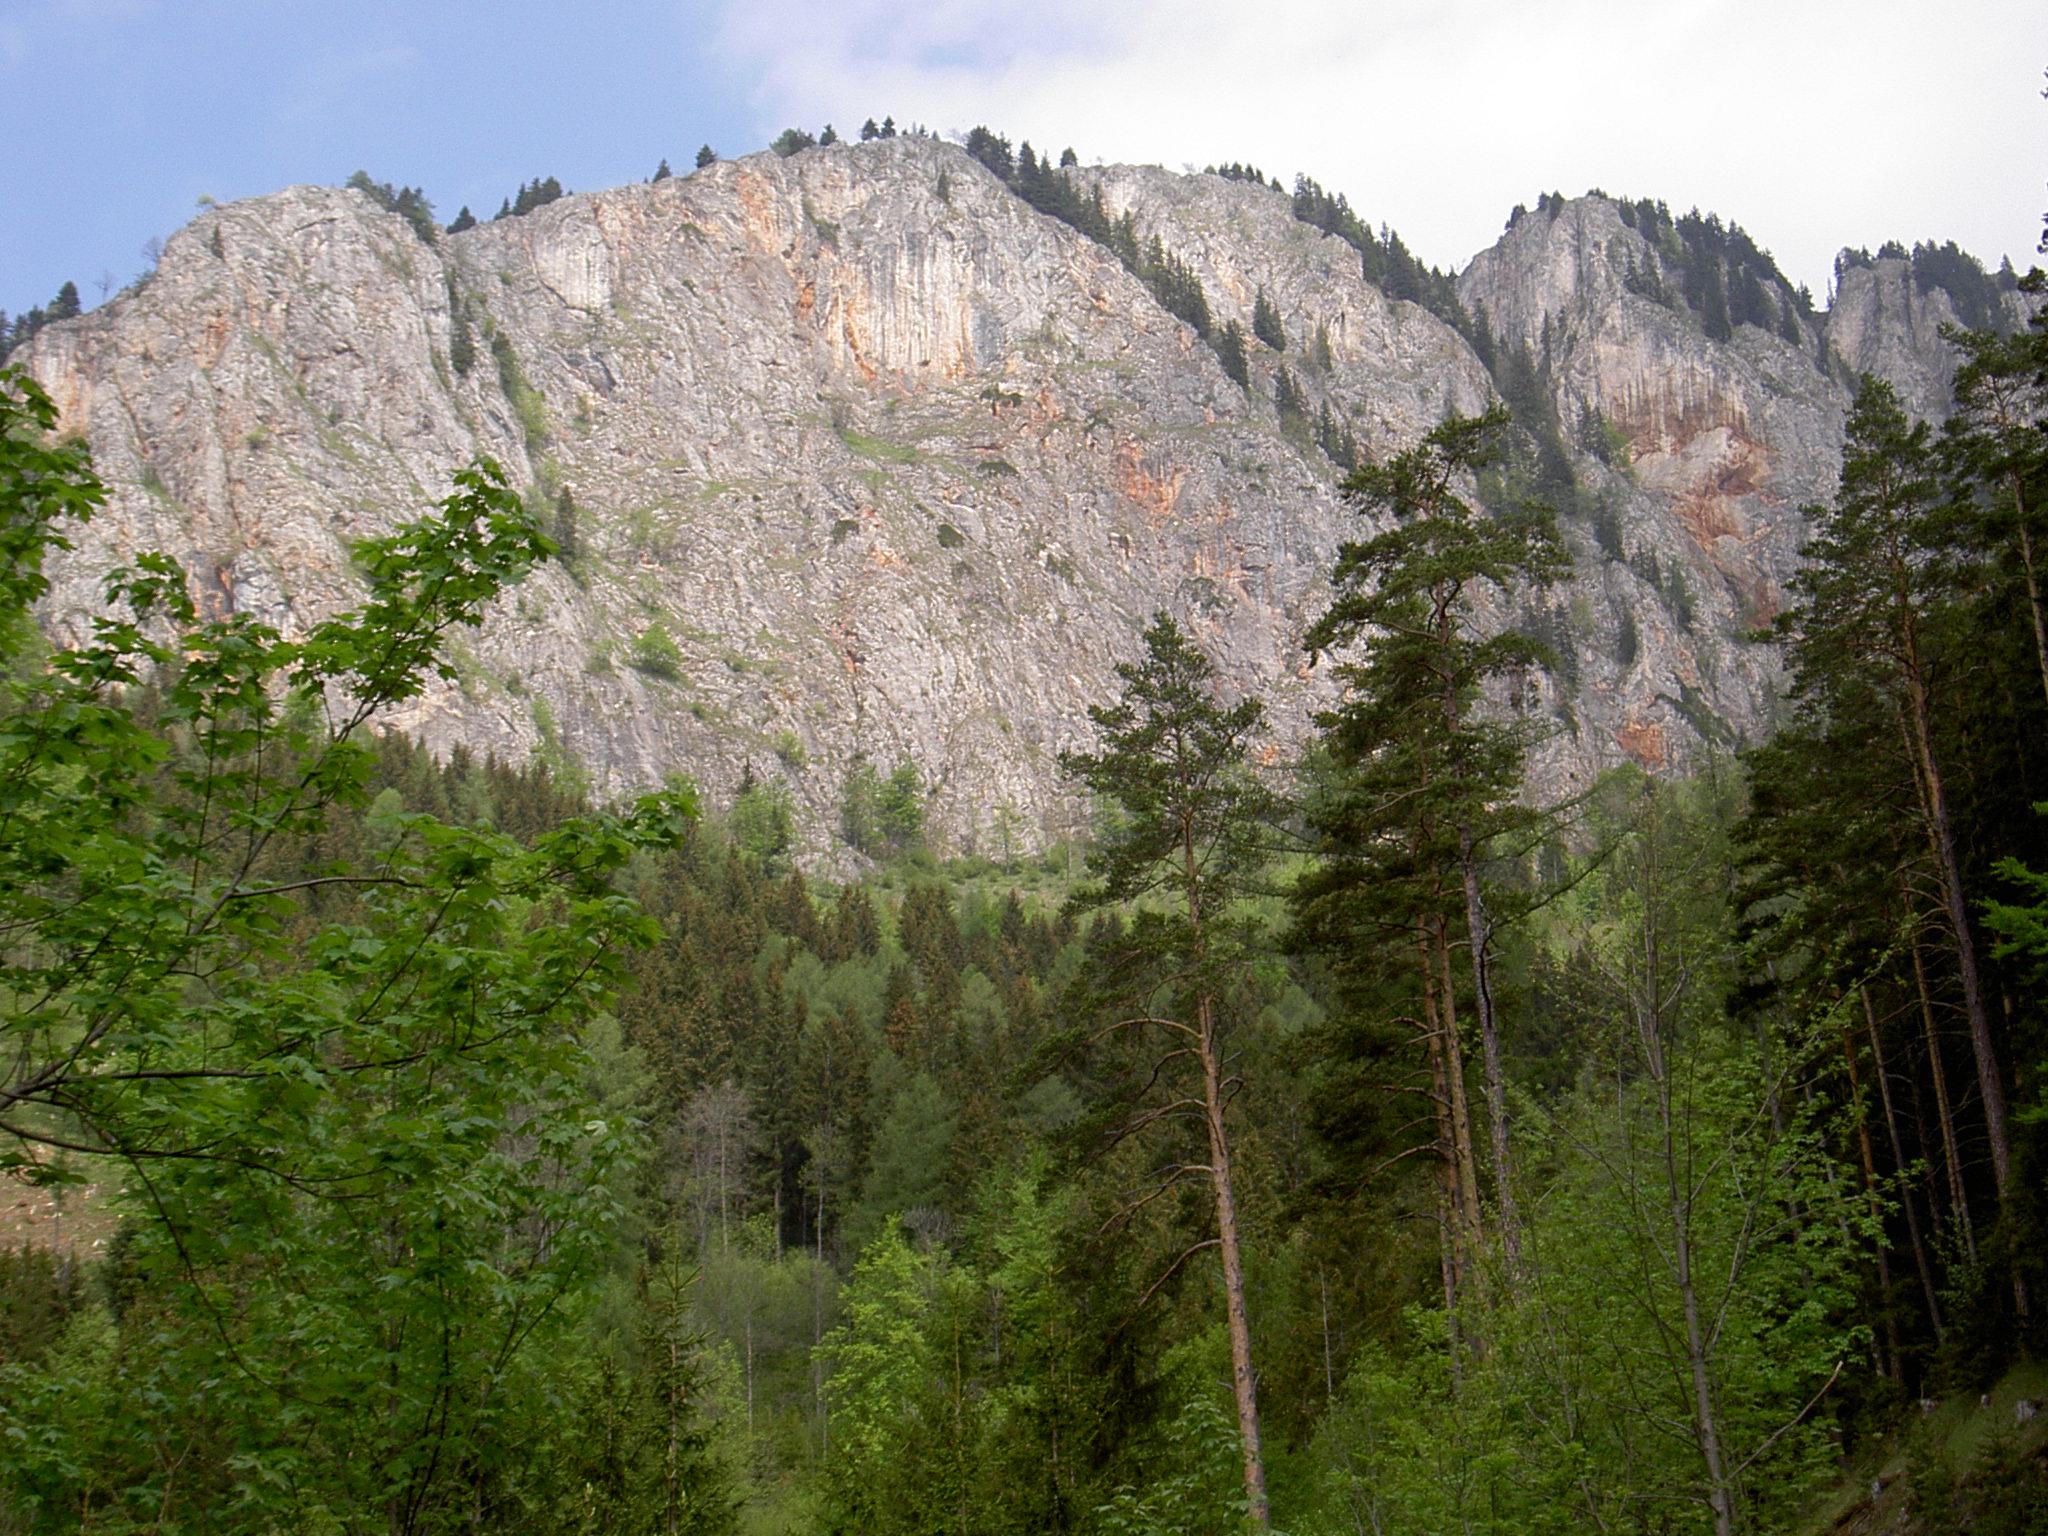 Rote wand grazer bergland wikiwand - Rote wand uberstreichen ...